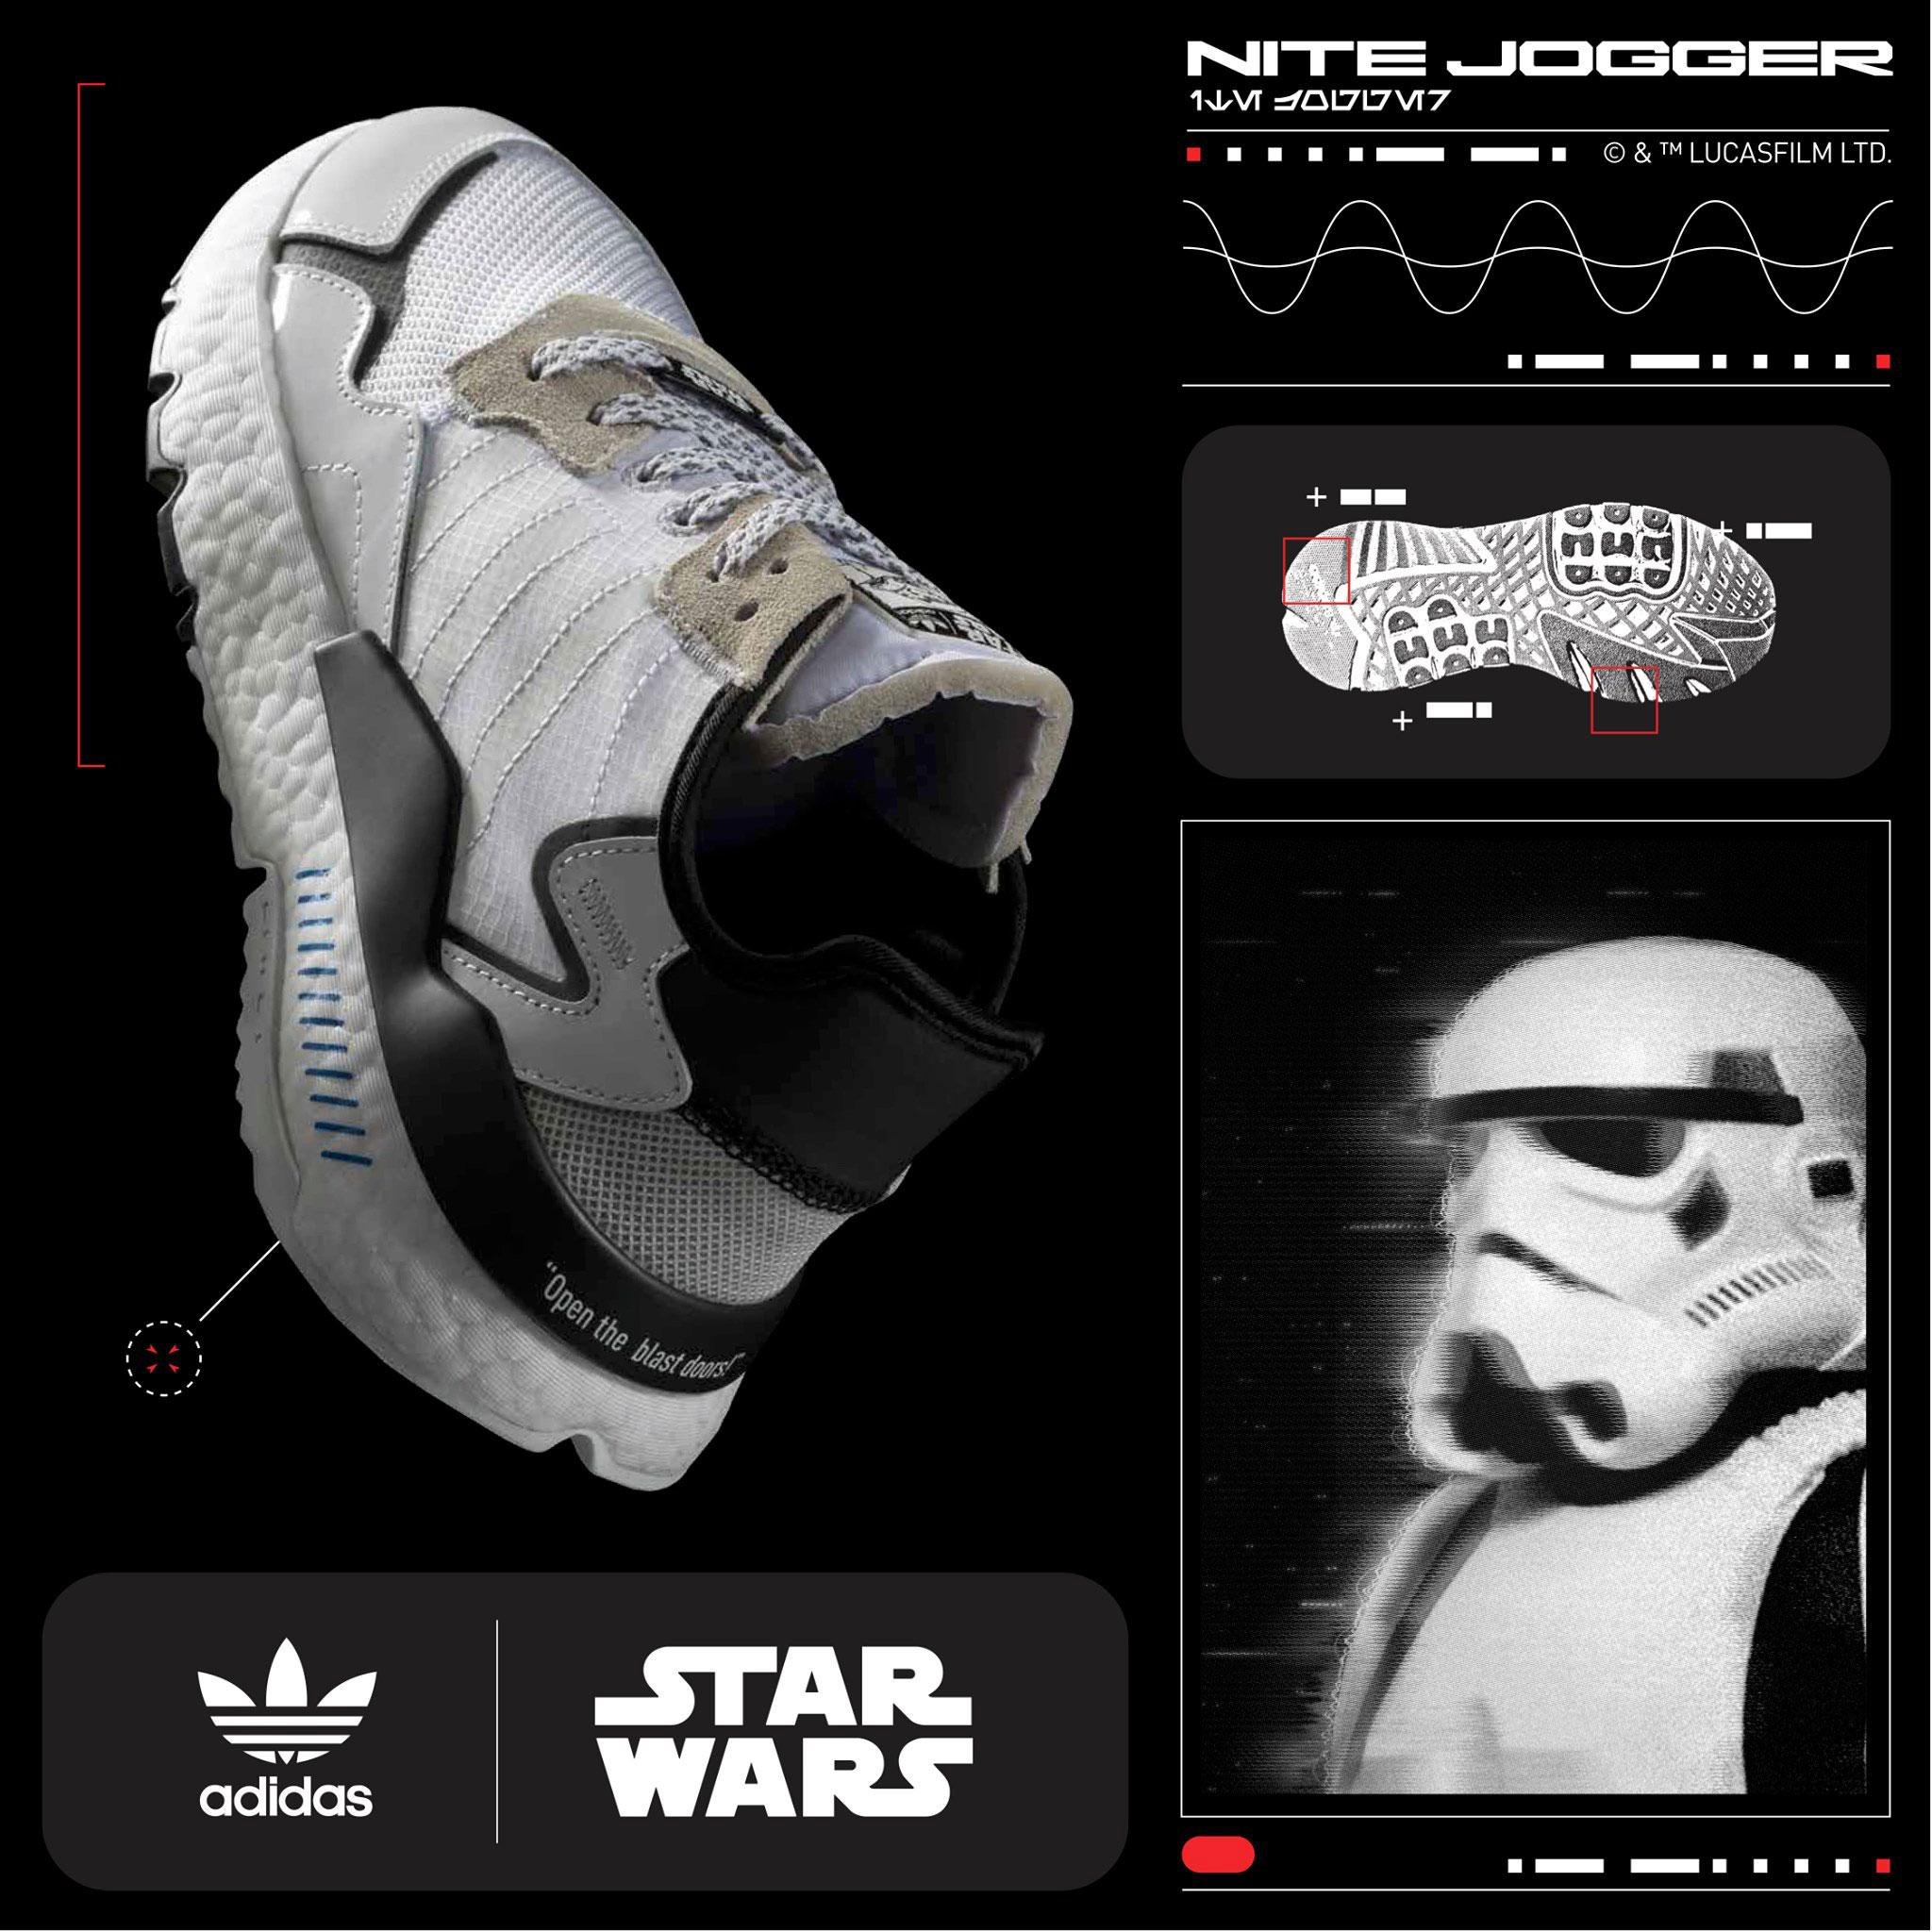 star-wars-adidas-stormtrooper-nite-jogger